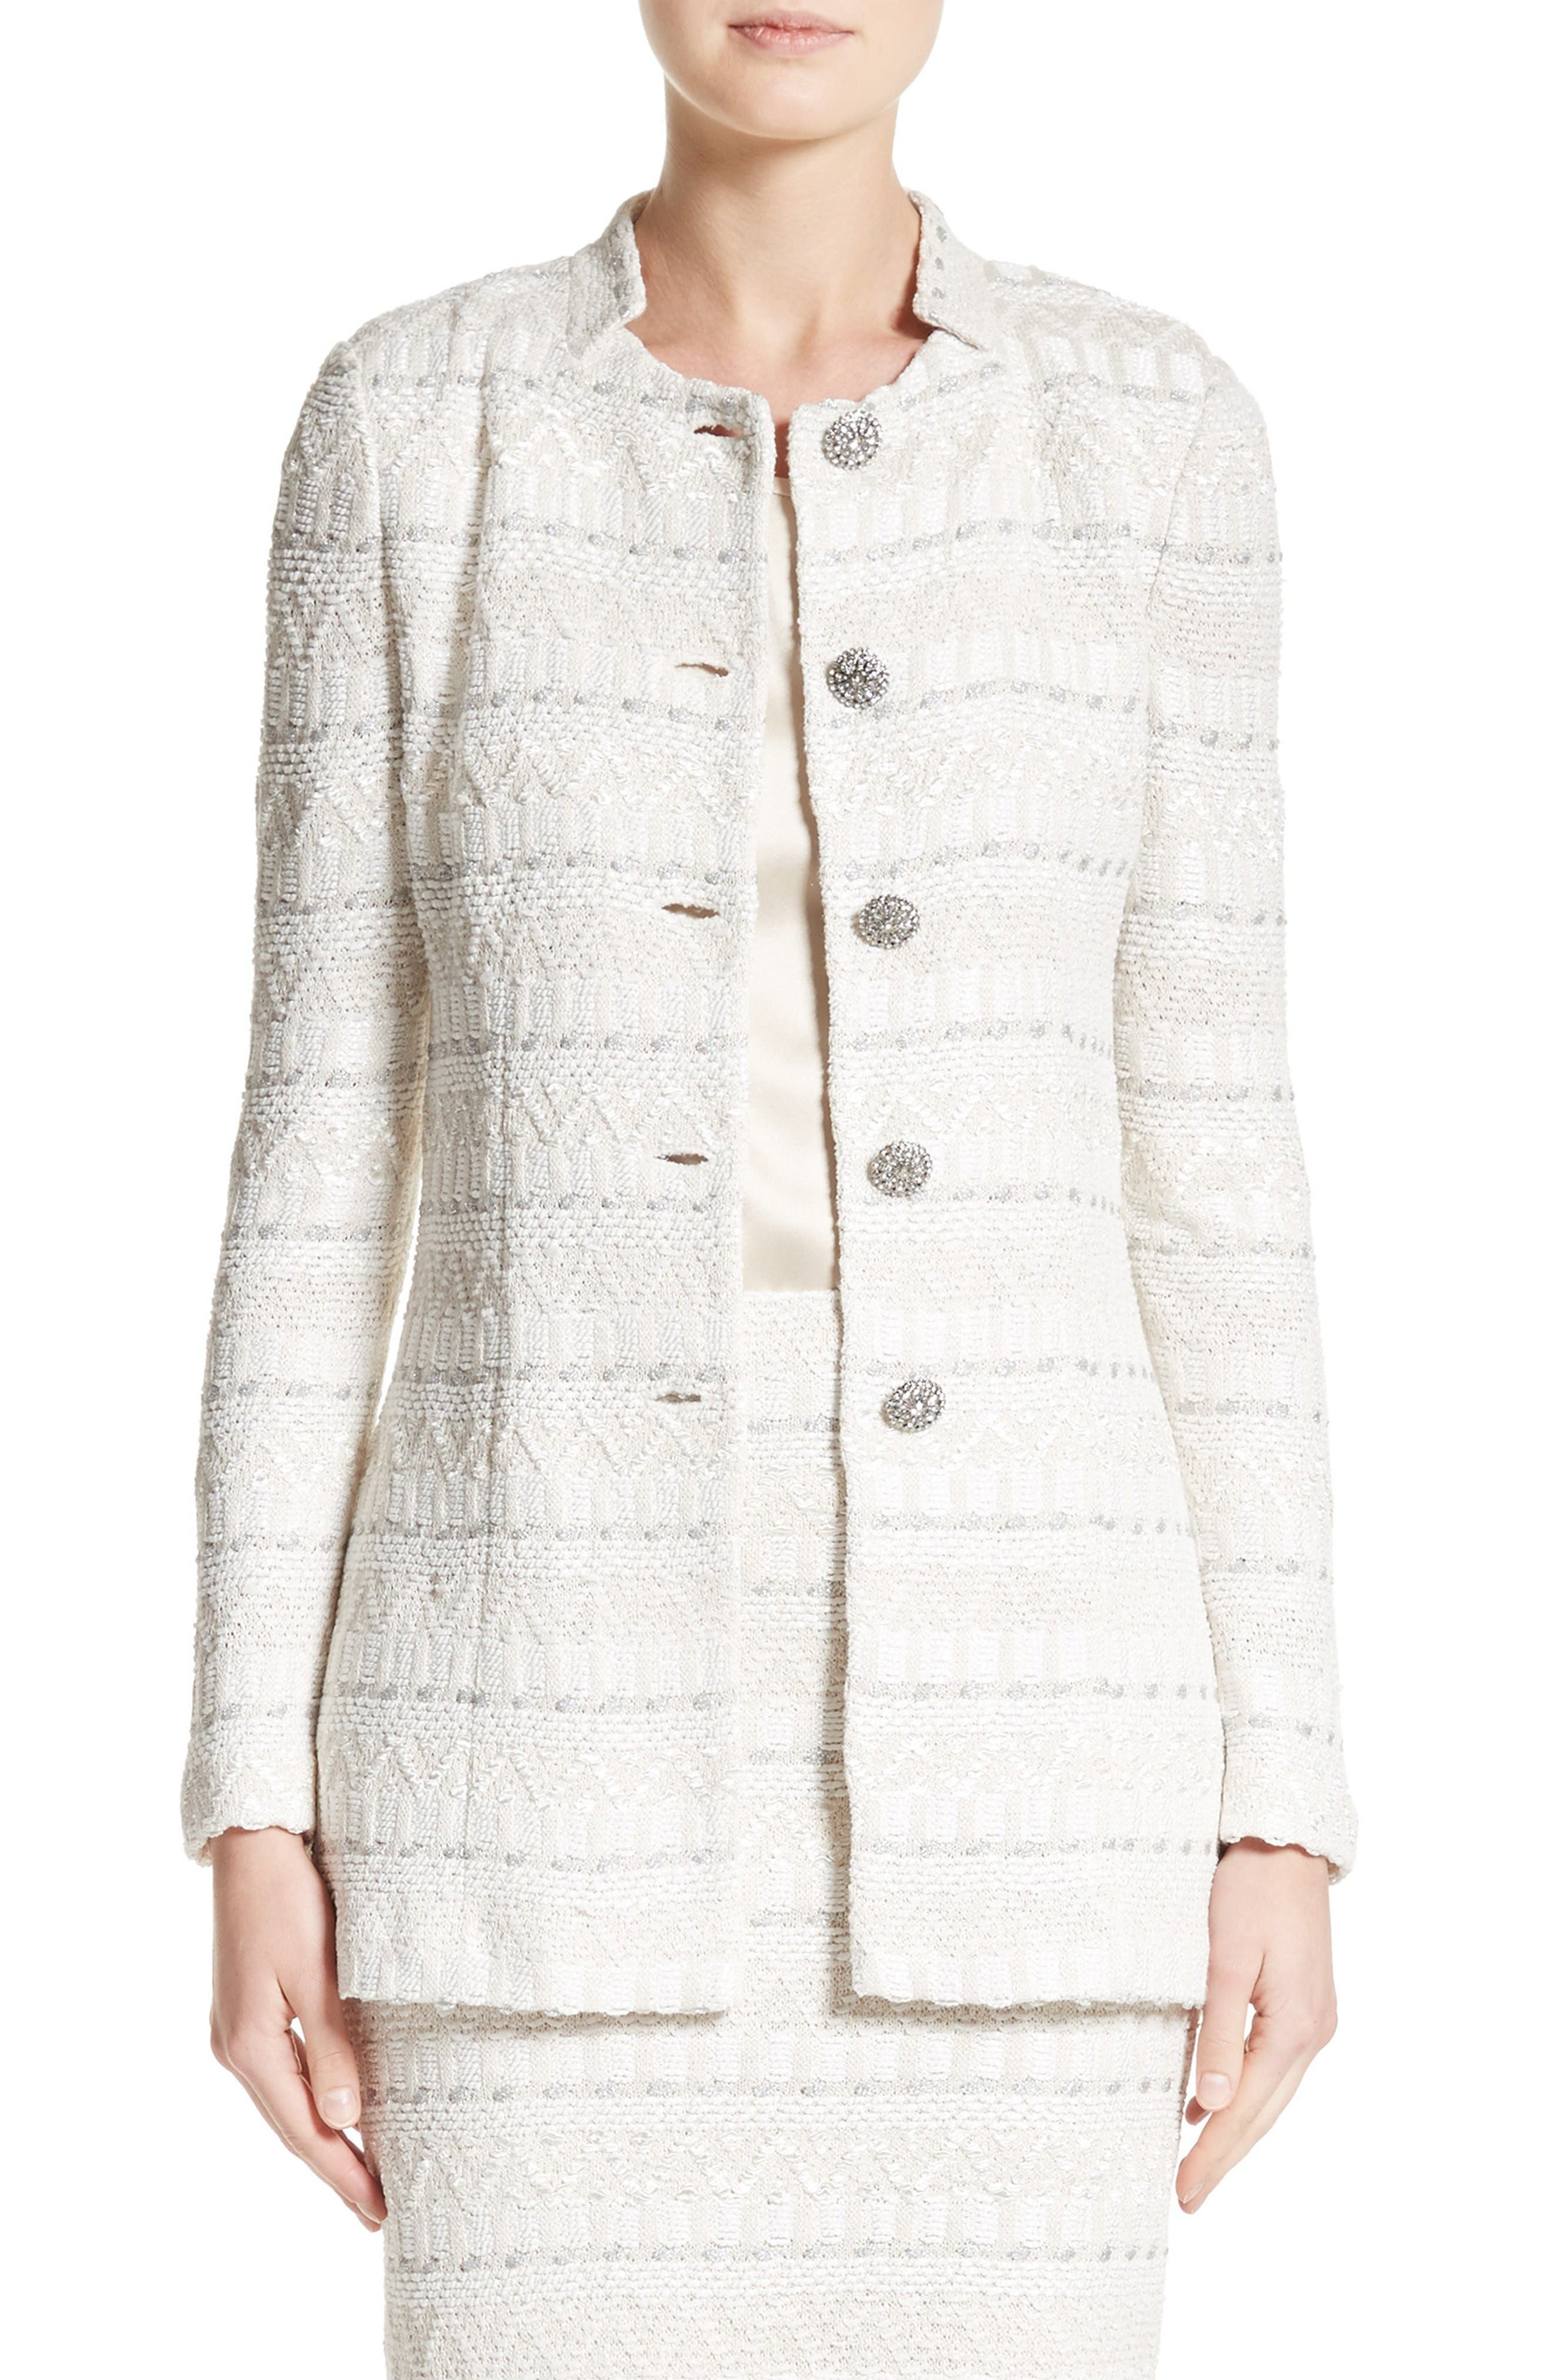 Alternate Image 1 Selected - St. John Collection Samar Knit Tweed Jacket